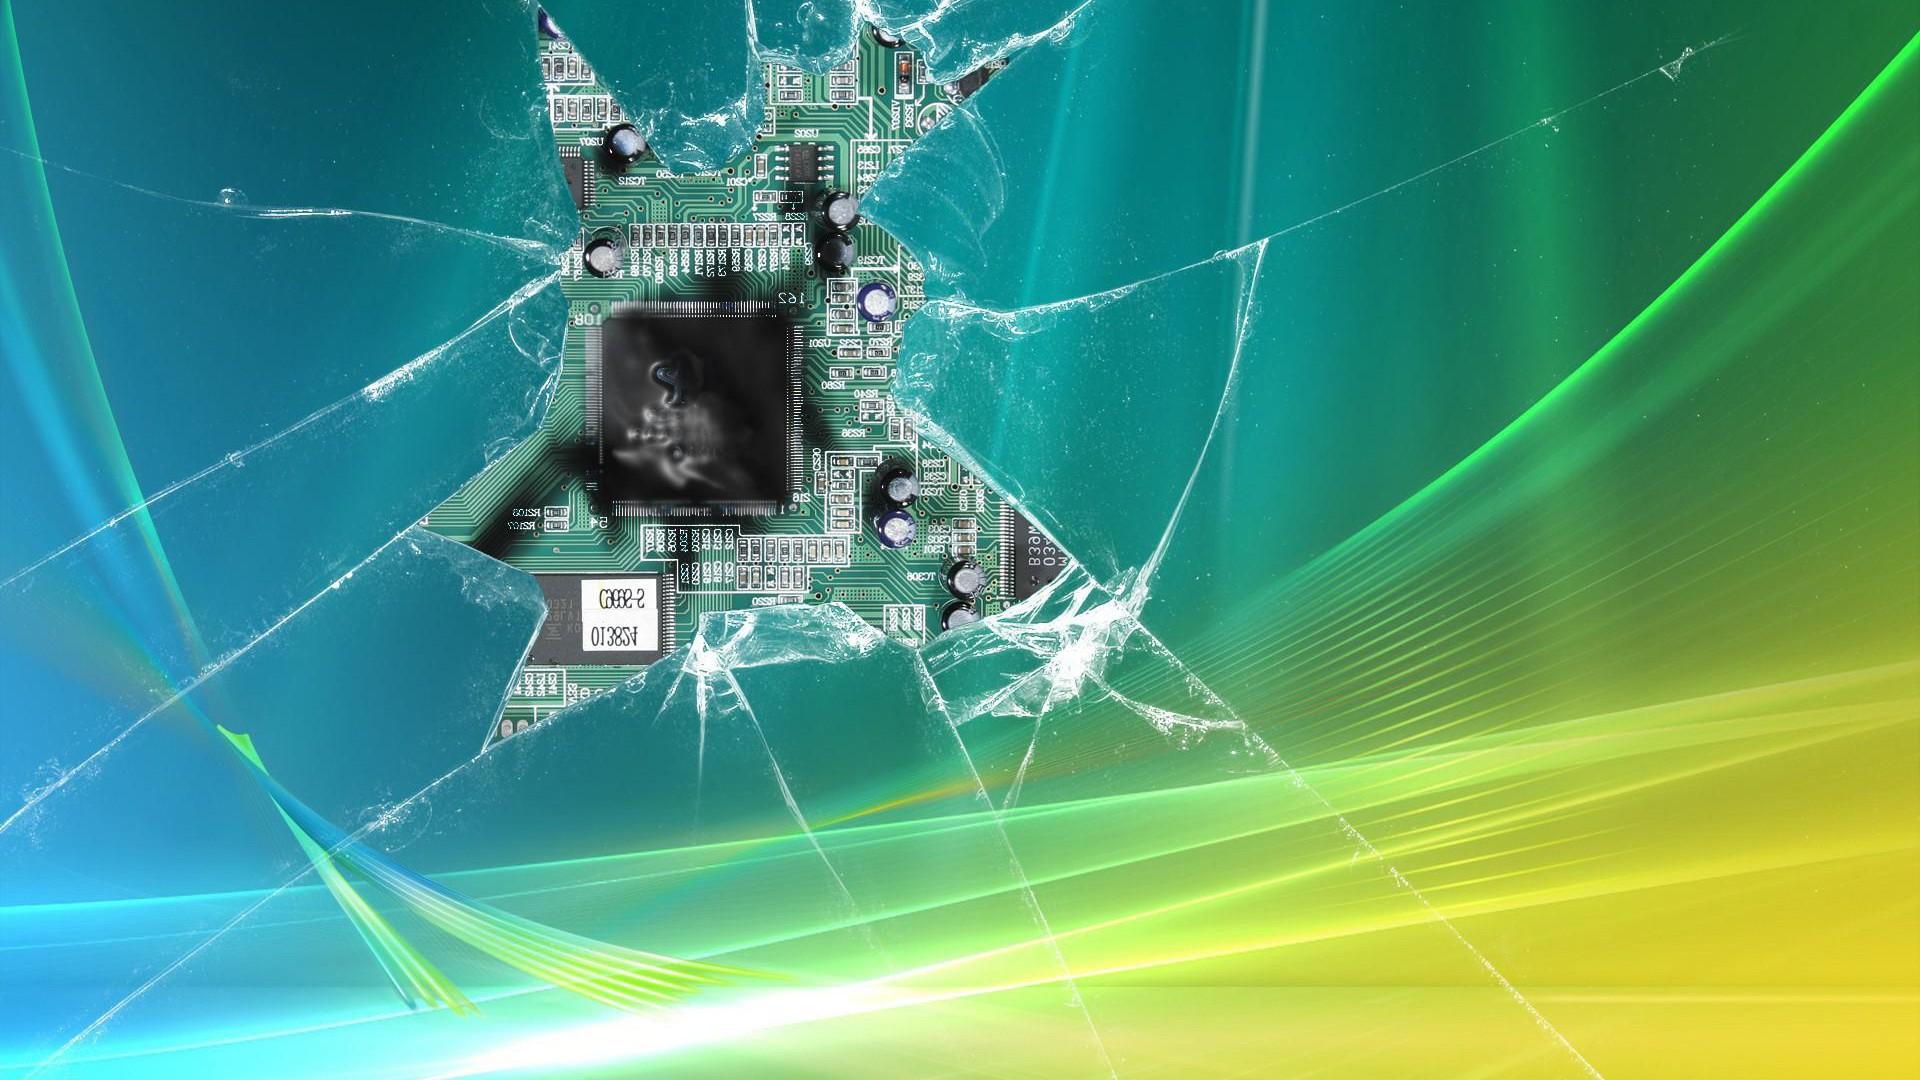 49 ] Realistic Broken Screen Wallpaper HD On WallpaperSafari